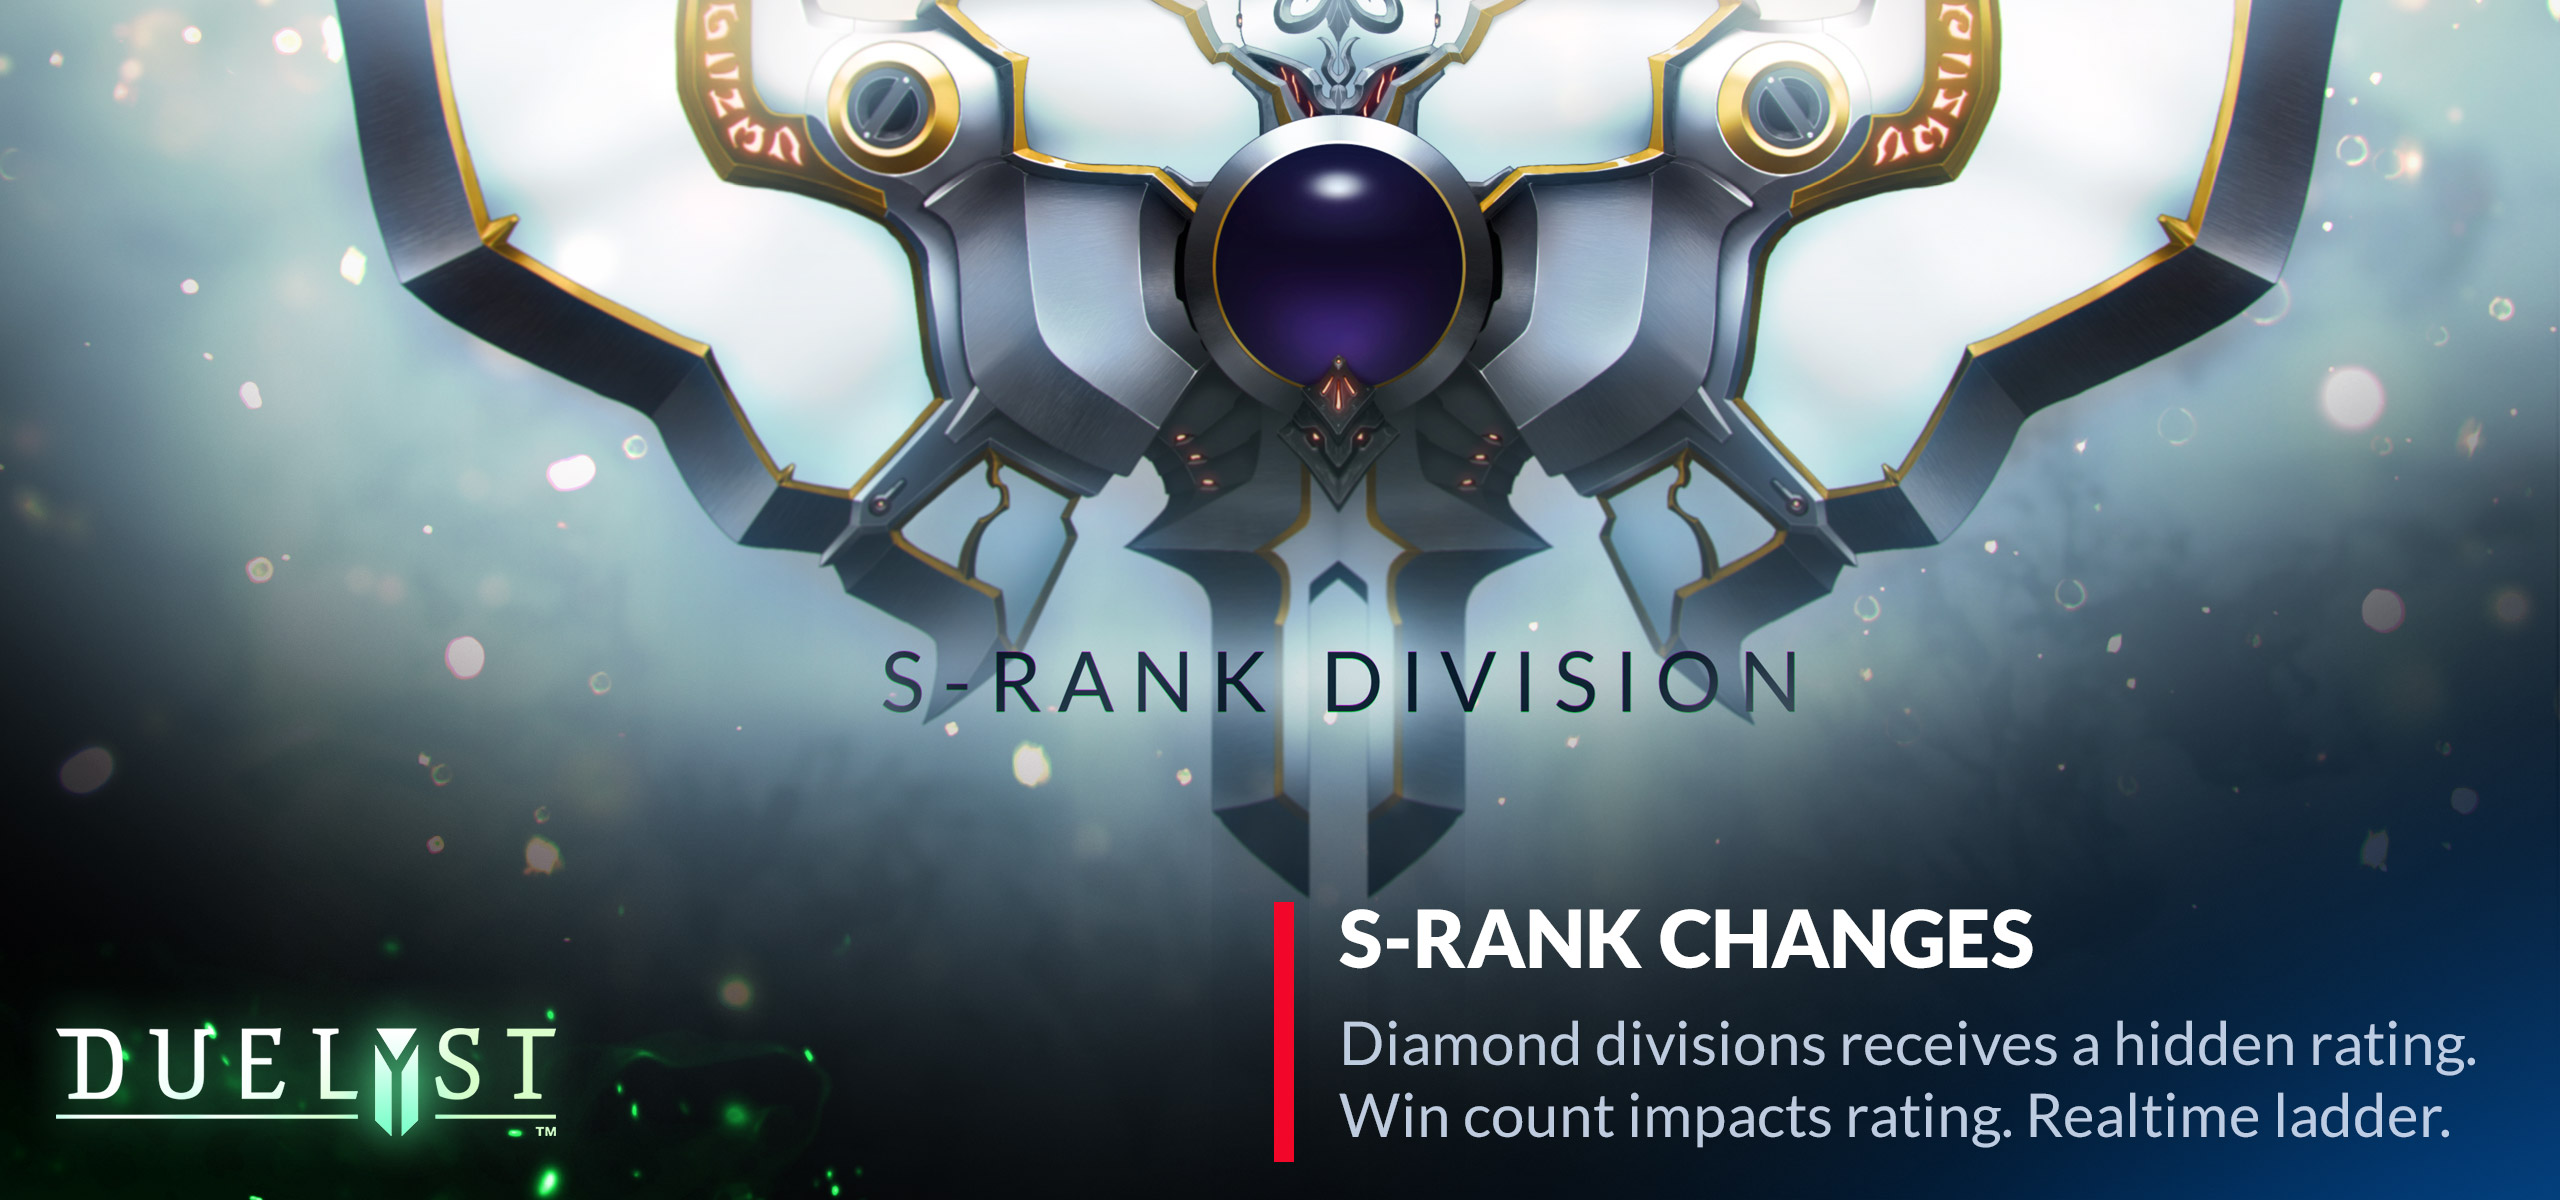 srank_changes